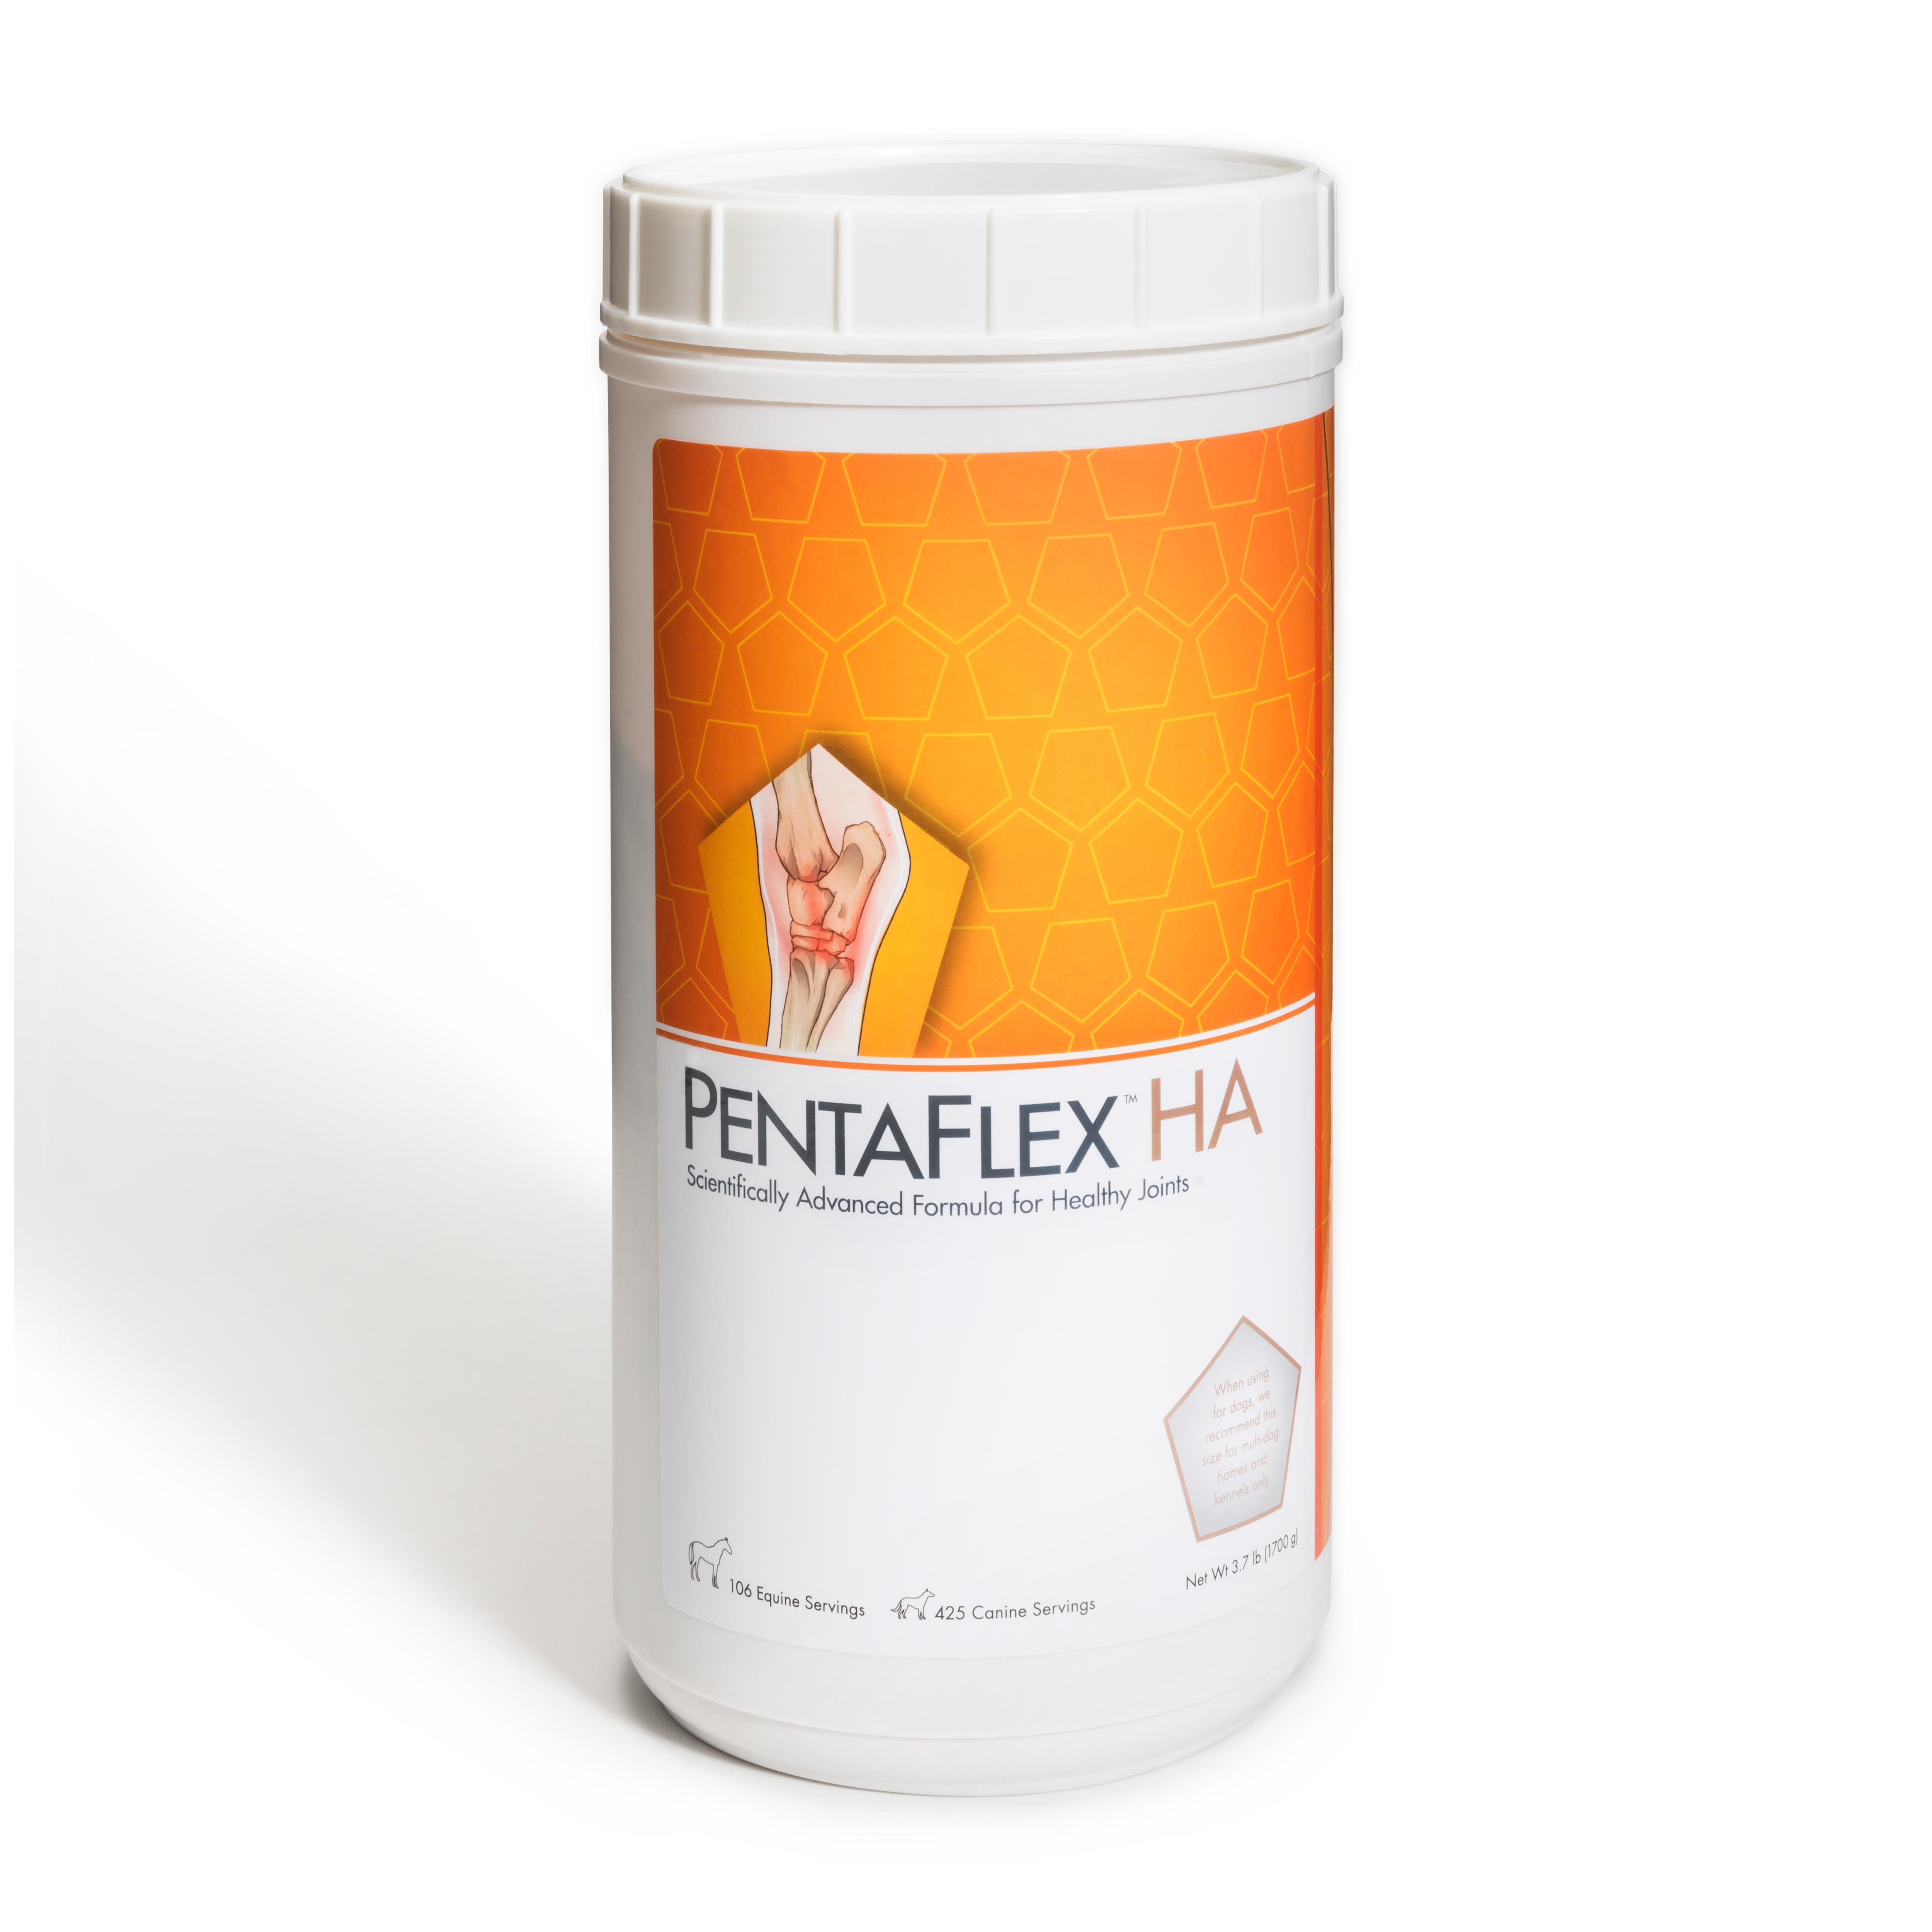 PentaFlex HA